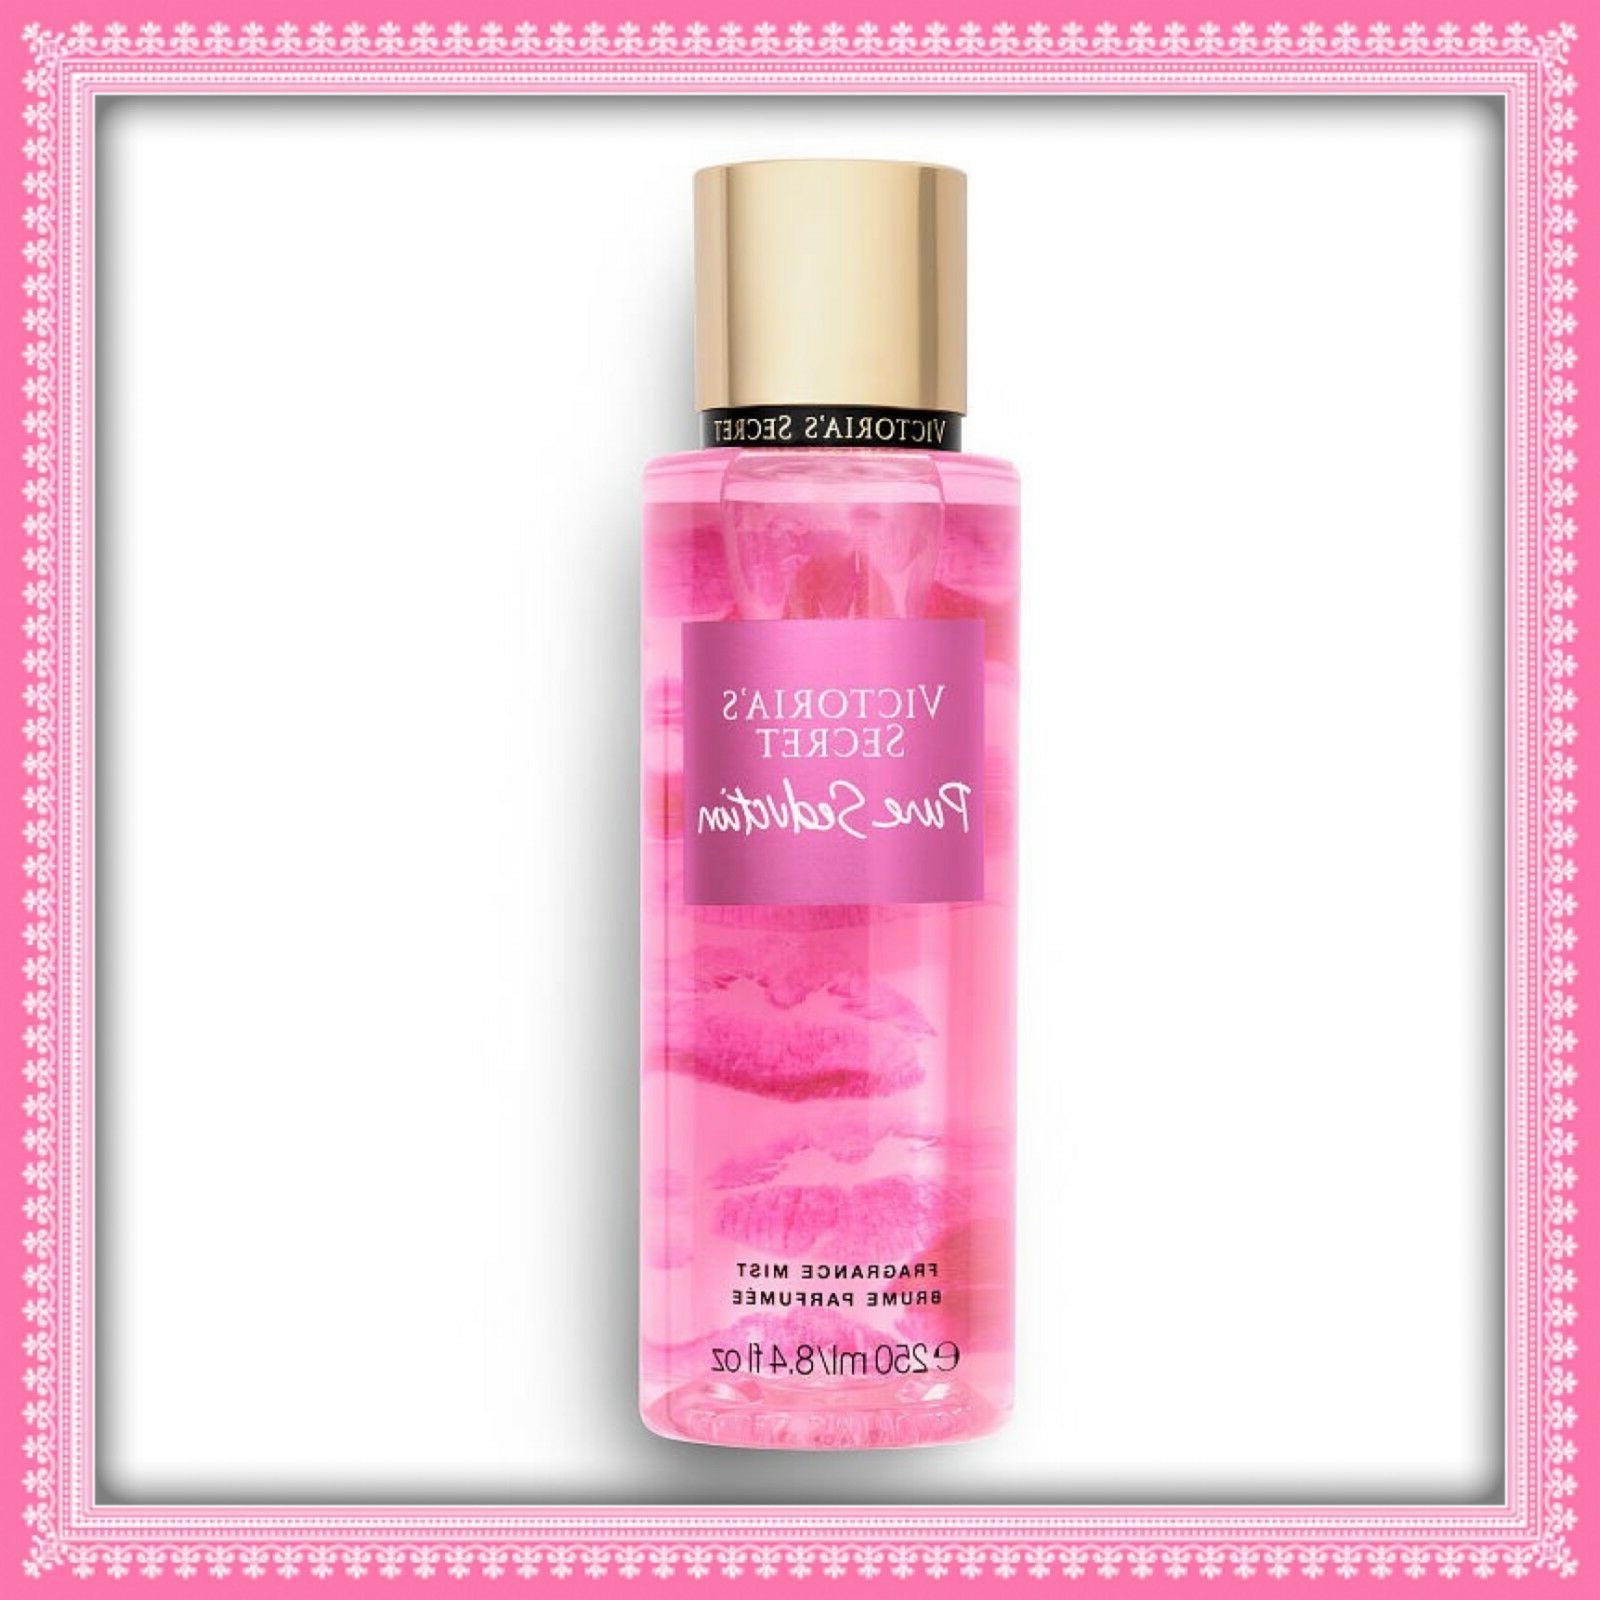 Victoria's Secret PURE SEDUCTION Fragrance Mist Body Spray